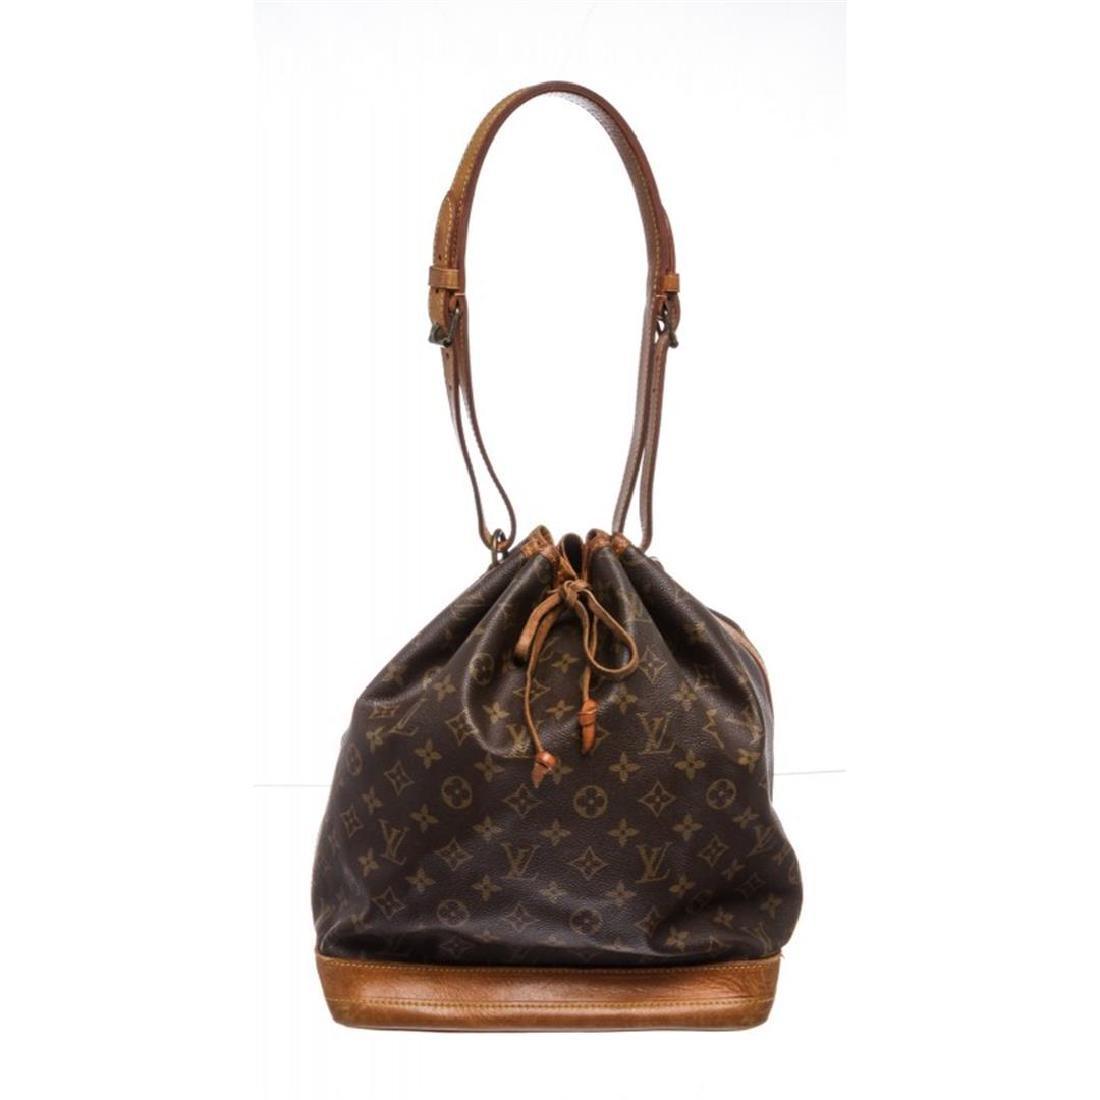 Louis Vuitton Monogram Canvas Leather Noe GM Drawstring